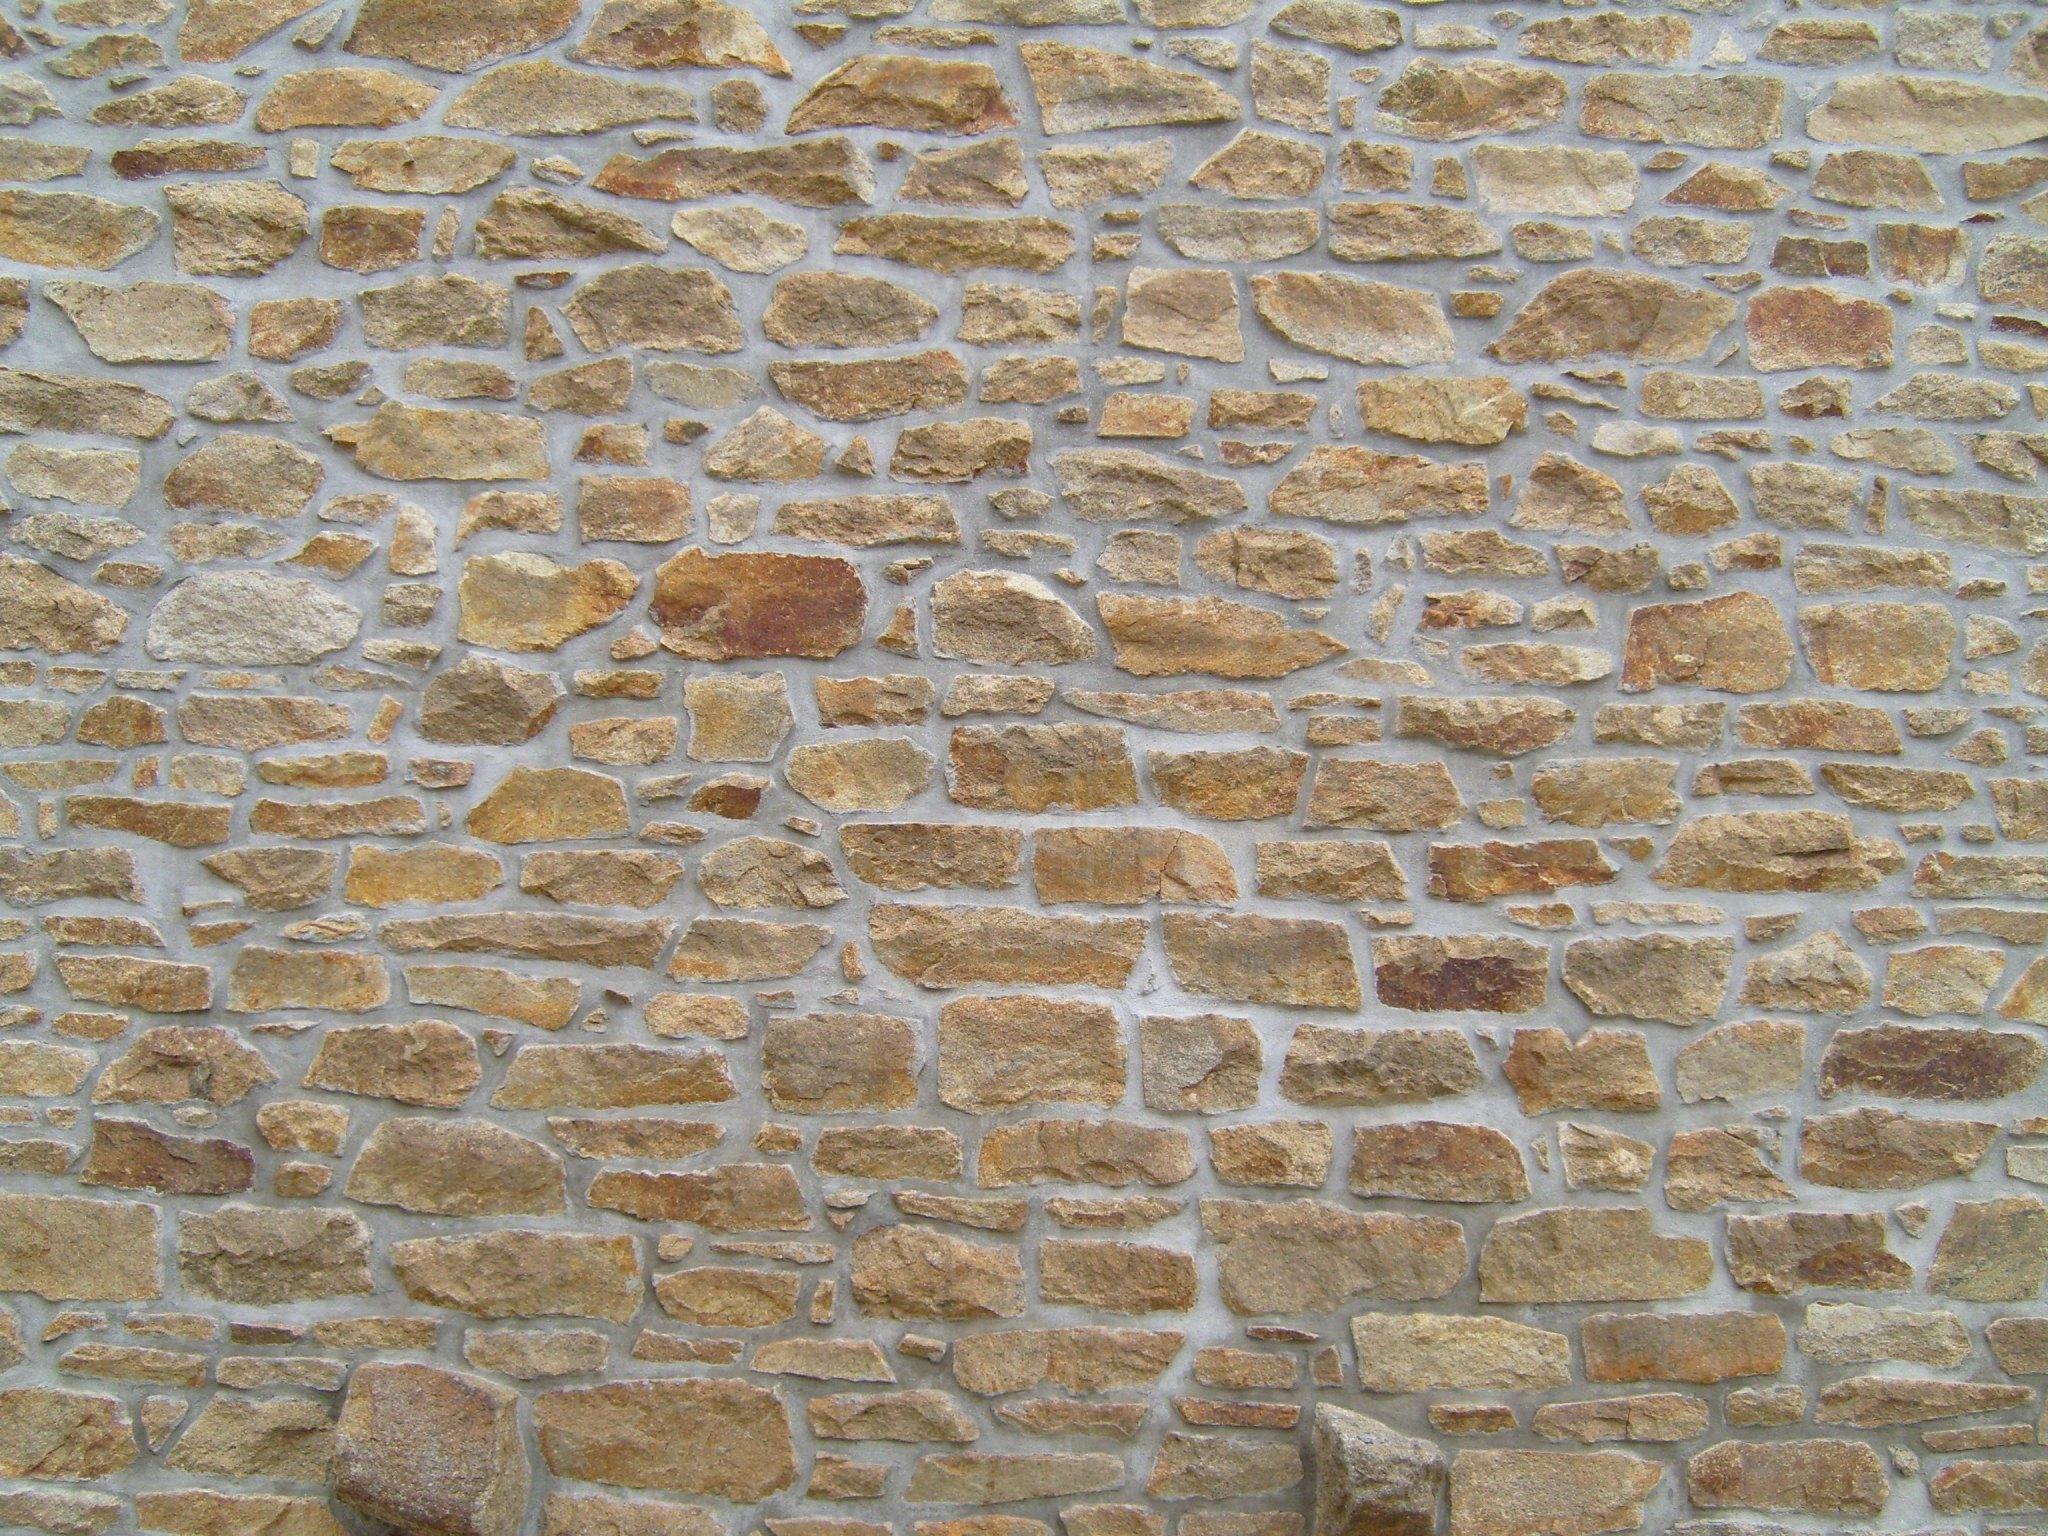 Description Old stone brick walljpg 2048x1536